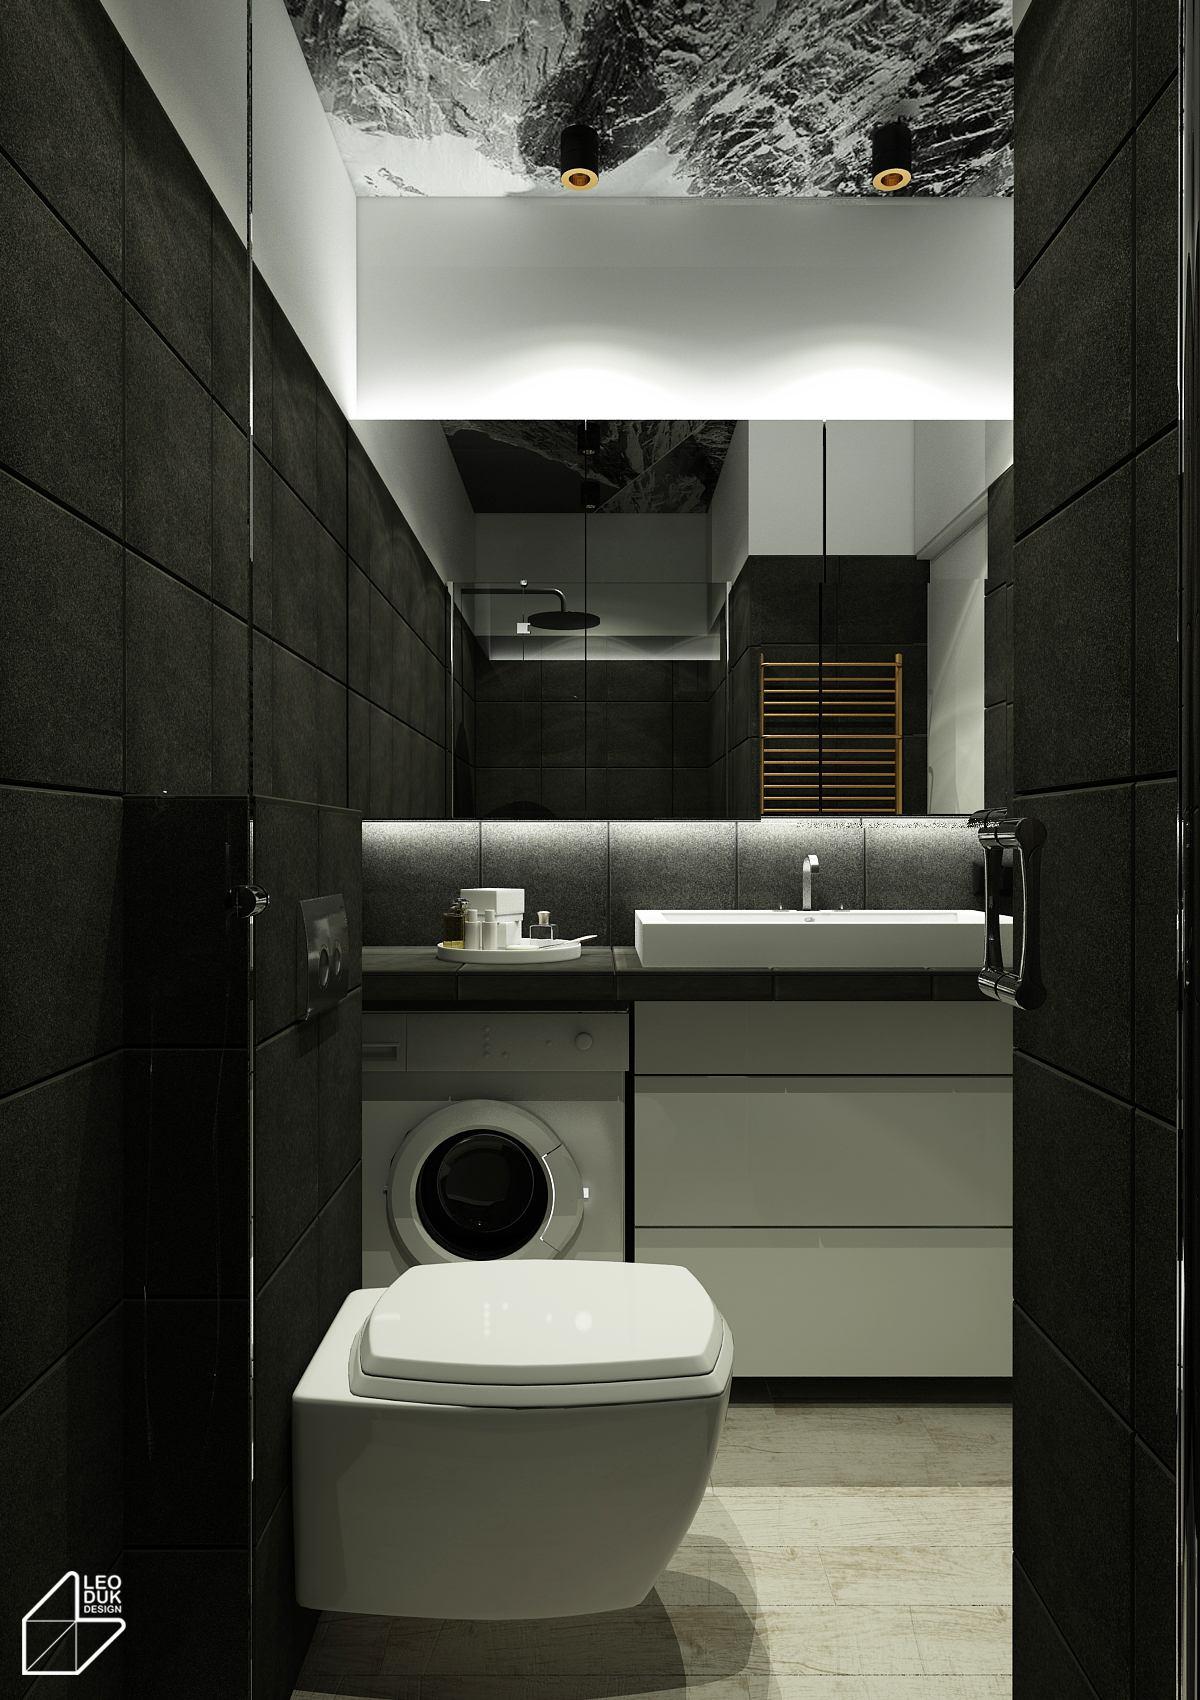 2 Minimalist Apartment Design Ideas With Beautiful Blue ... on Bathroom Ideas Apartment  id=29635